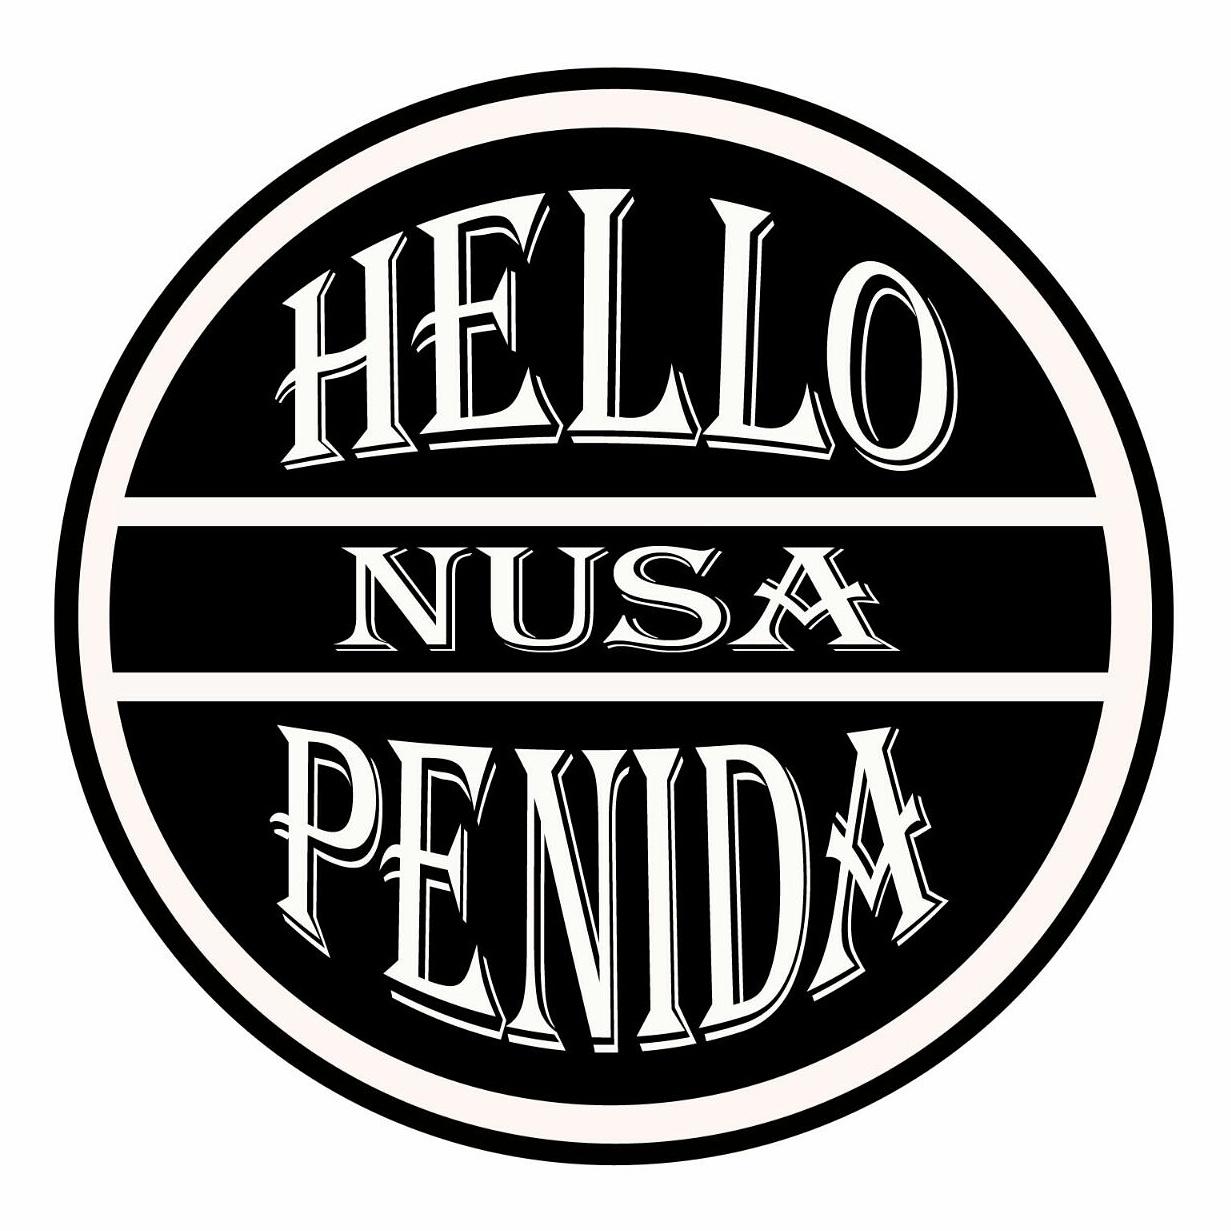 hello nusa penida cara pemesanan paket tours Manta Point Nusa Penida untuk pemesanan paket wisata nusa penida silahkan